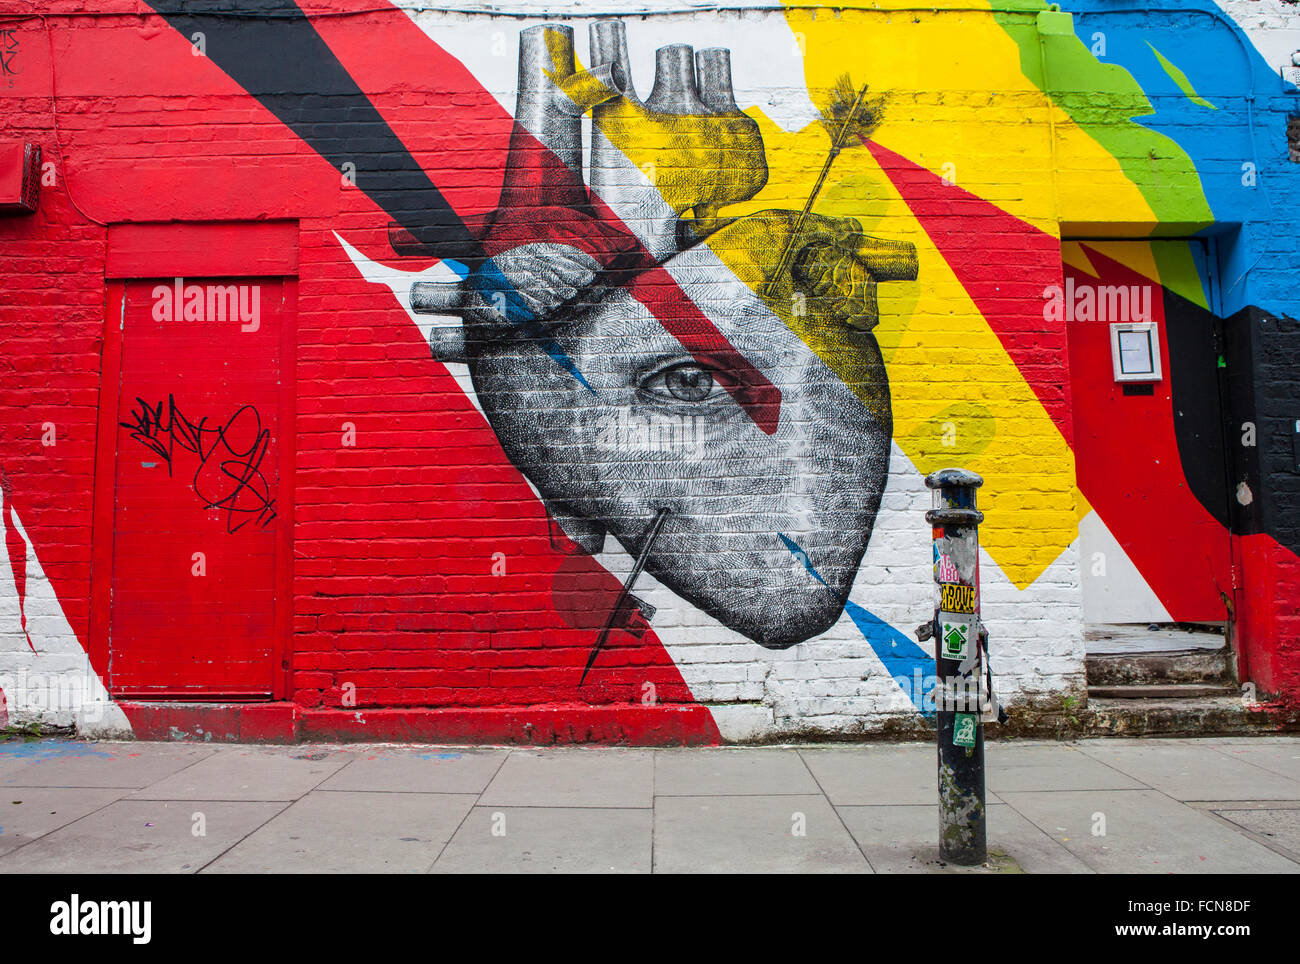 LONDON, UK - 13. Januar 2016: Urban Street Art Darstellung ein ...